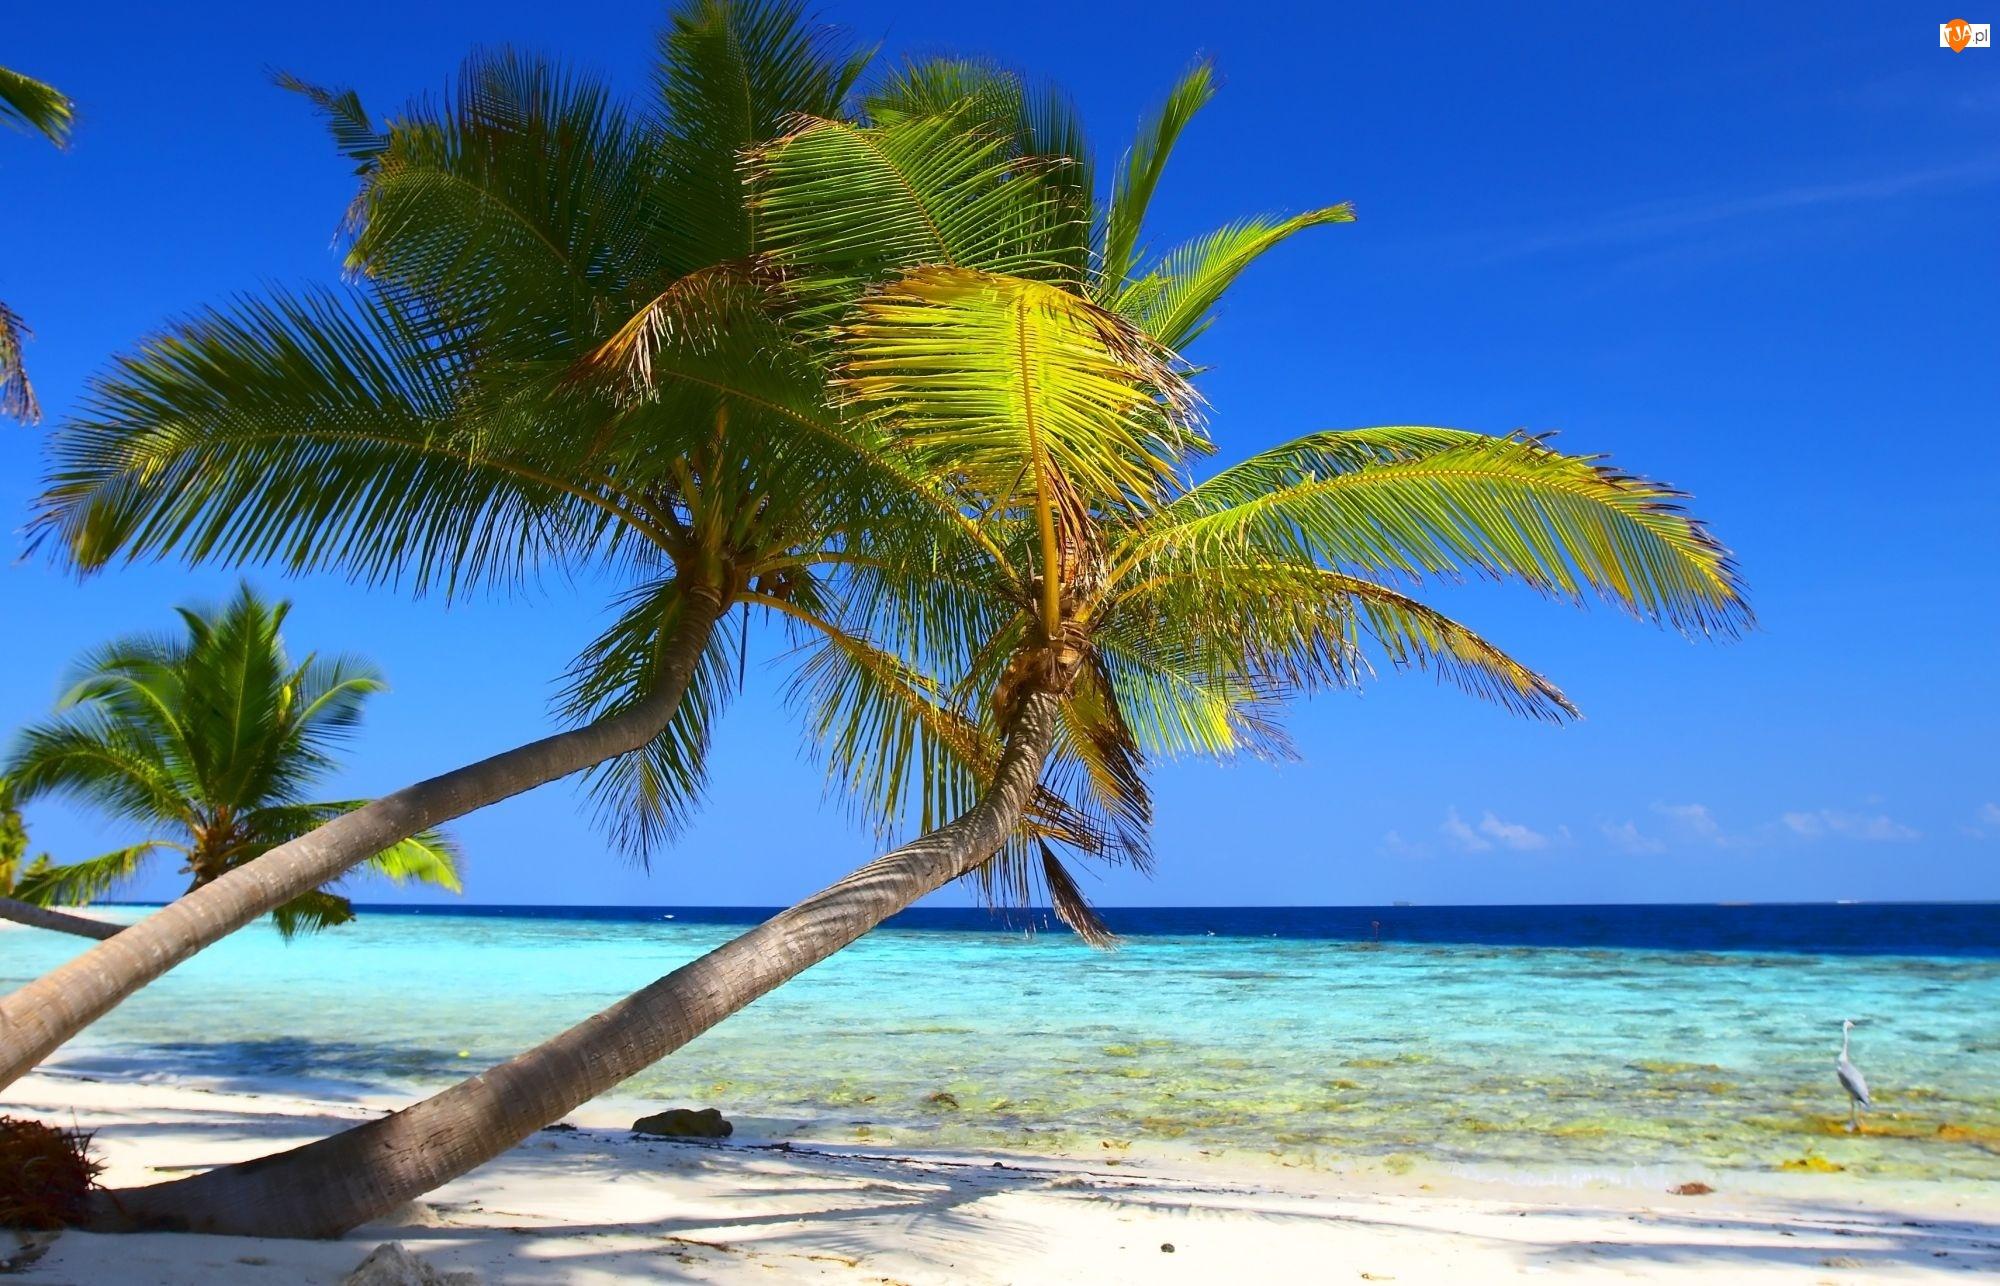 Plaża, Pochyłe, Kokosowe, Palmy, Niebo